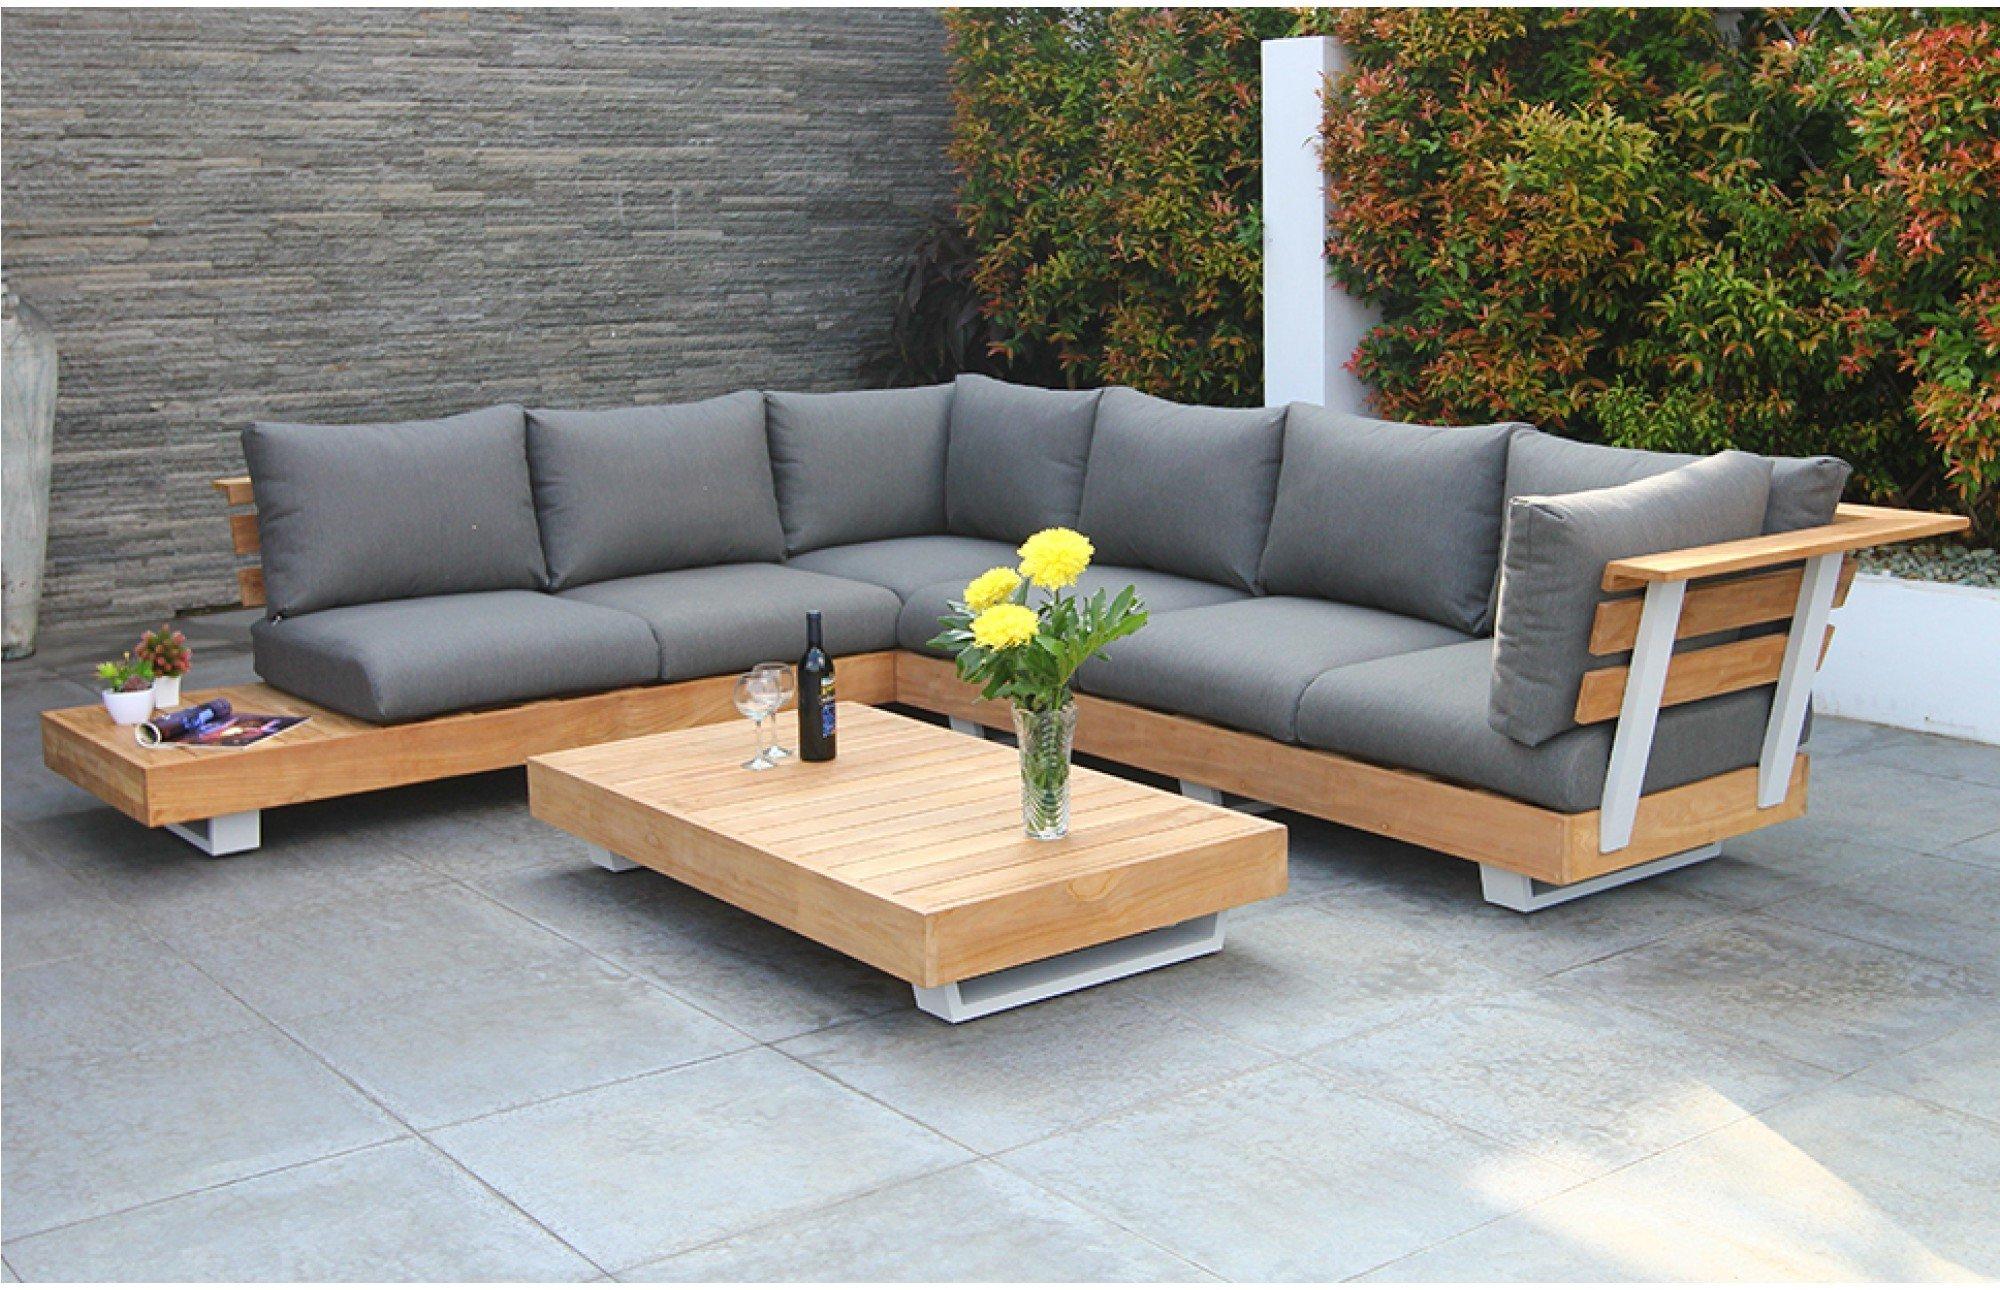 3d gartenplaner test data becker 3d gartenplaner 14 test. Black Bedroom Furniture Sets. Home Design Ideas